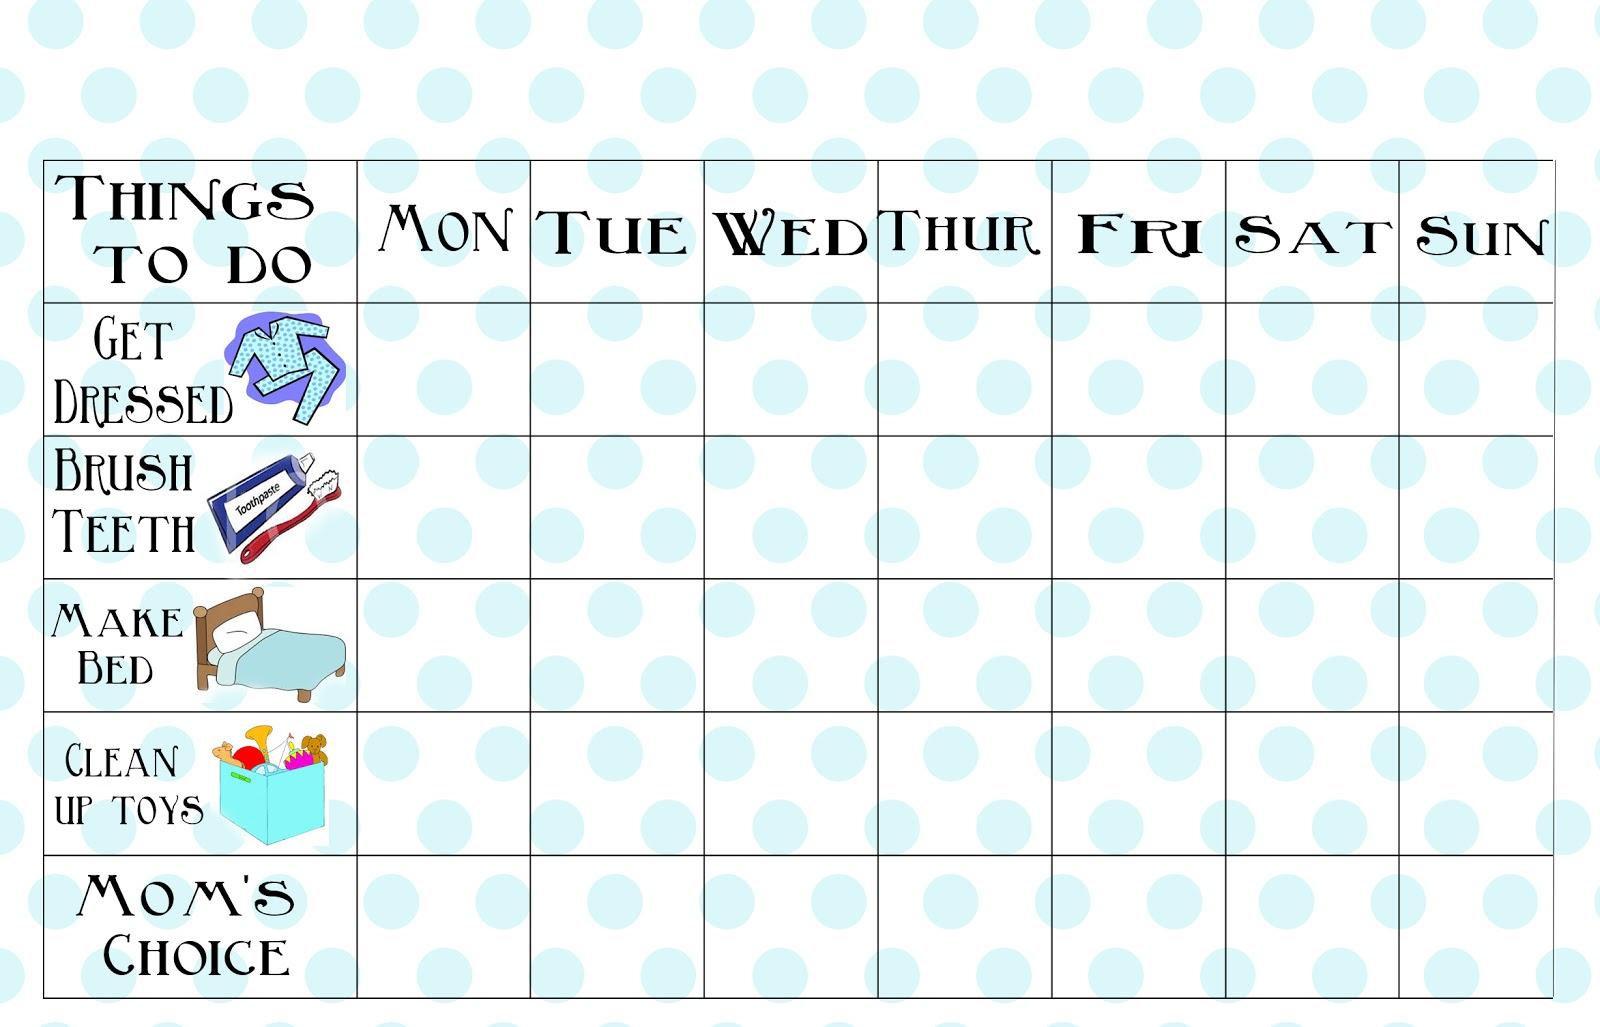 Free Printable Chore Chart - Free Printable Chore Charts